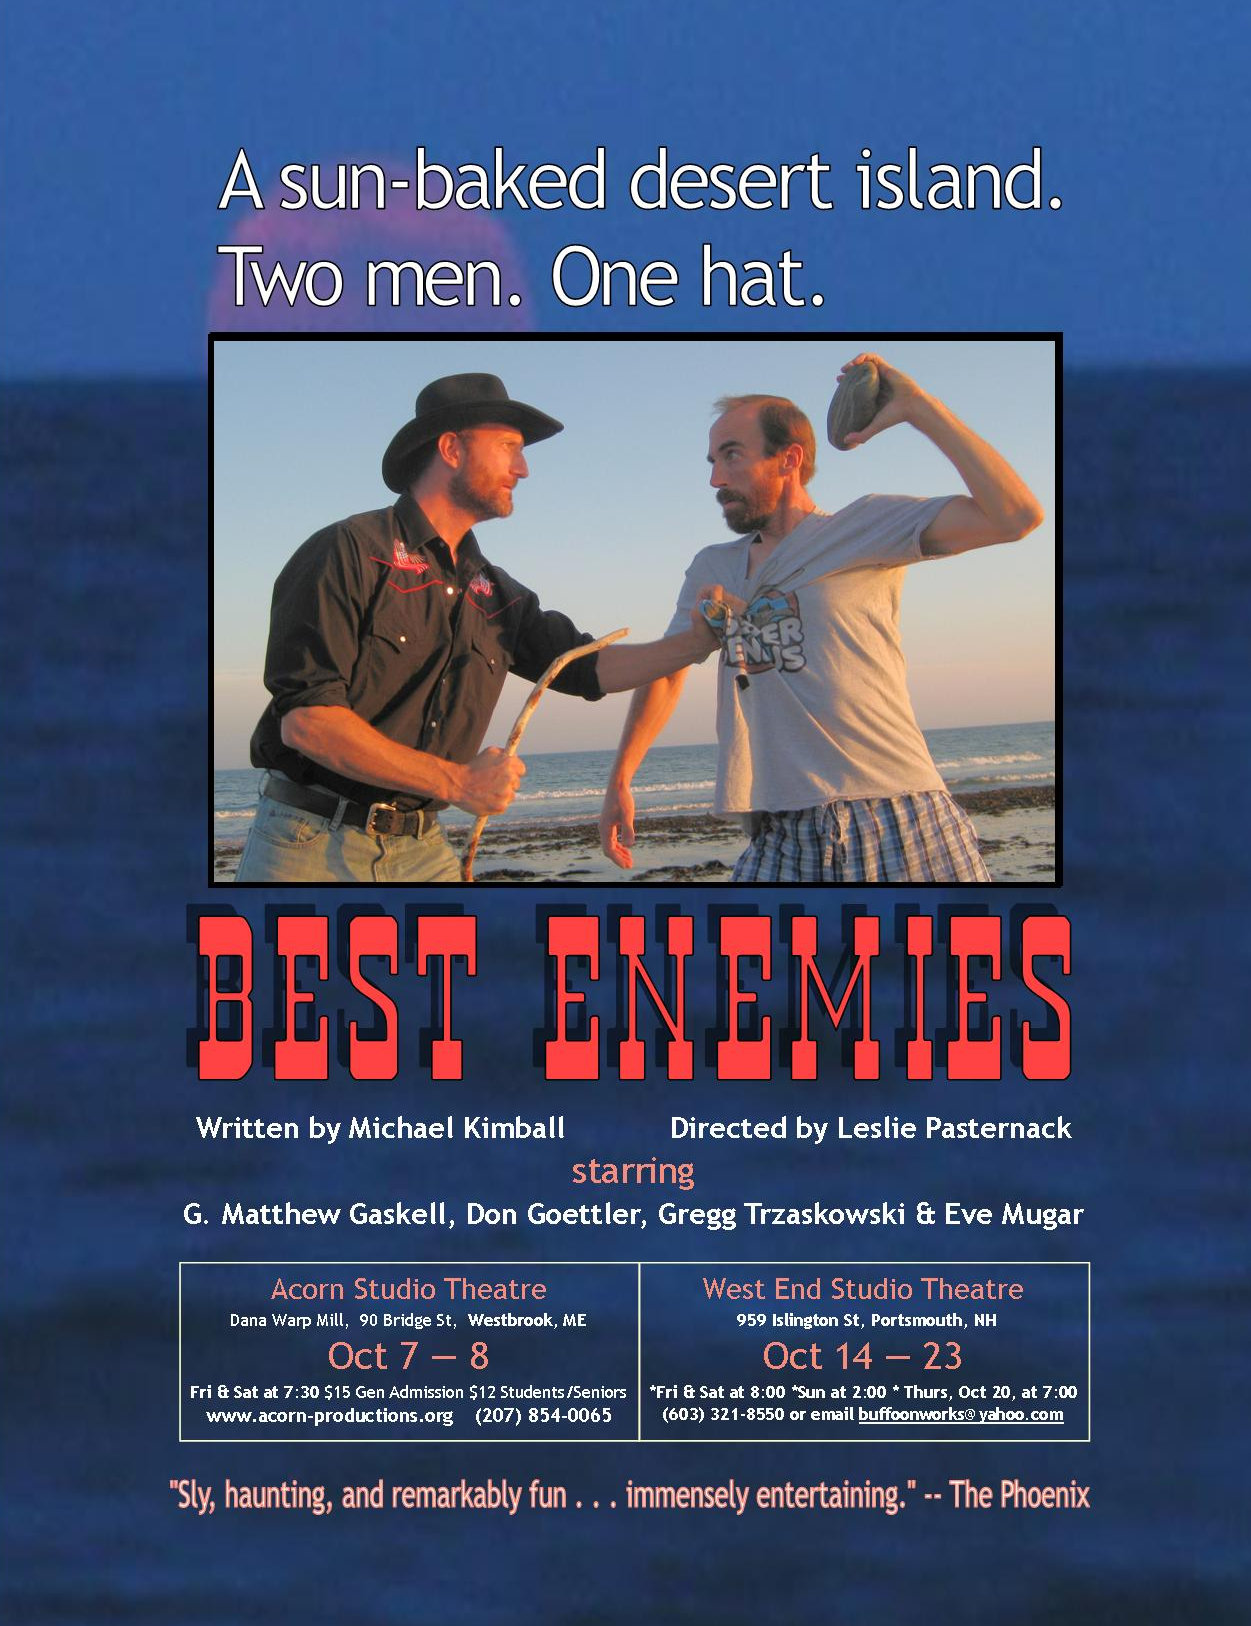 Best-Enemies-Production-Flyer-both-theaters.jpg